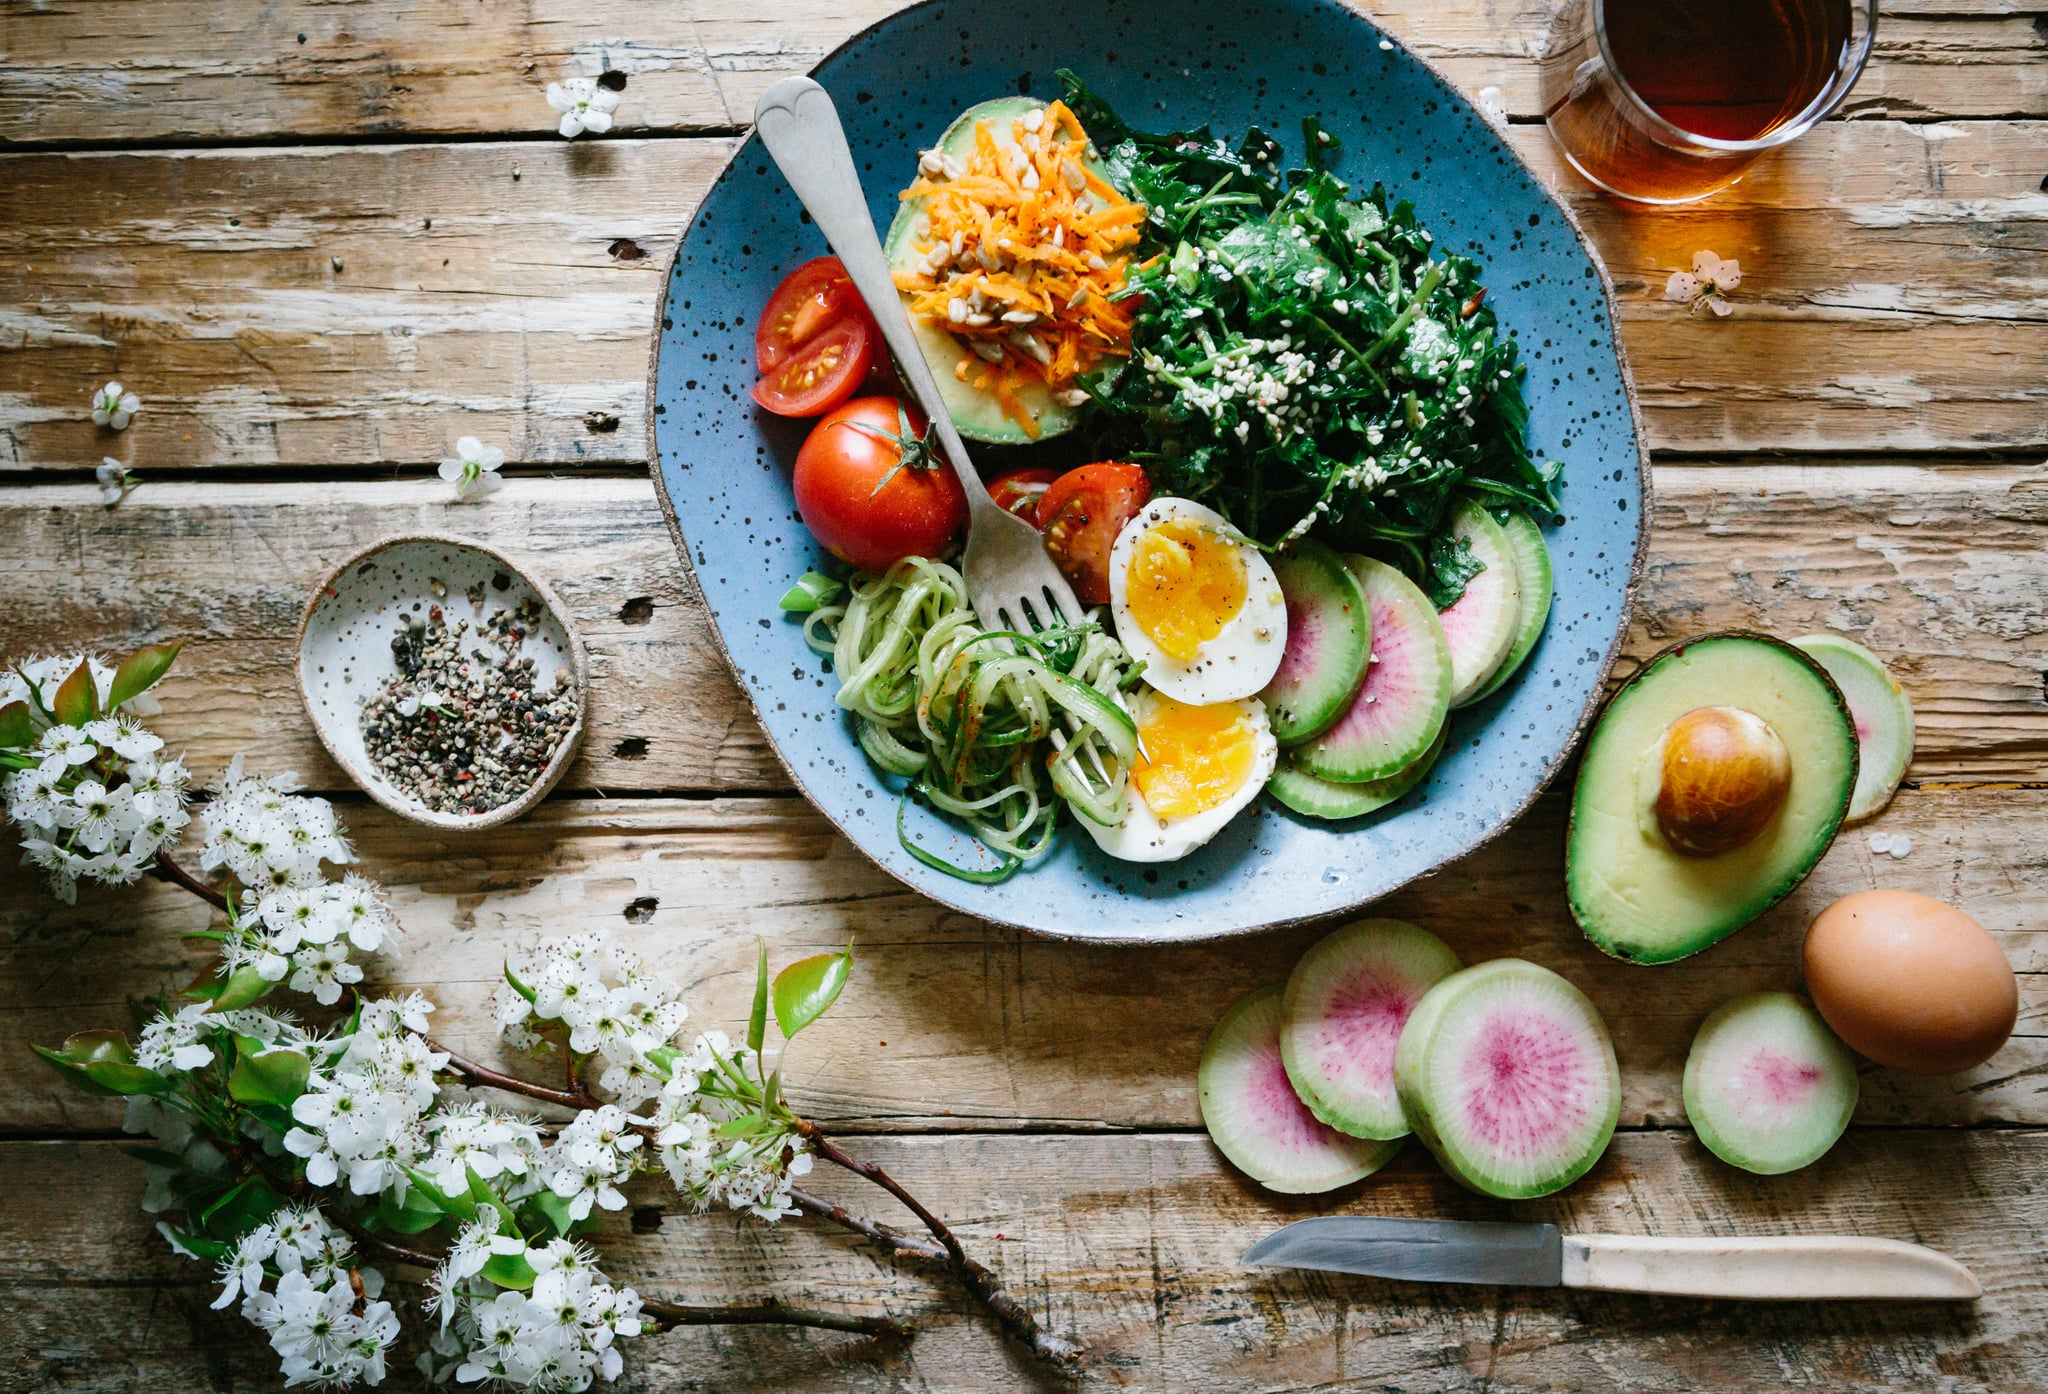 How to Reset Your Diet | POPSUGAR Fitness Australia